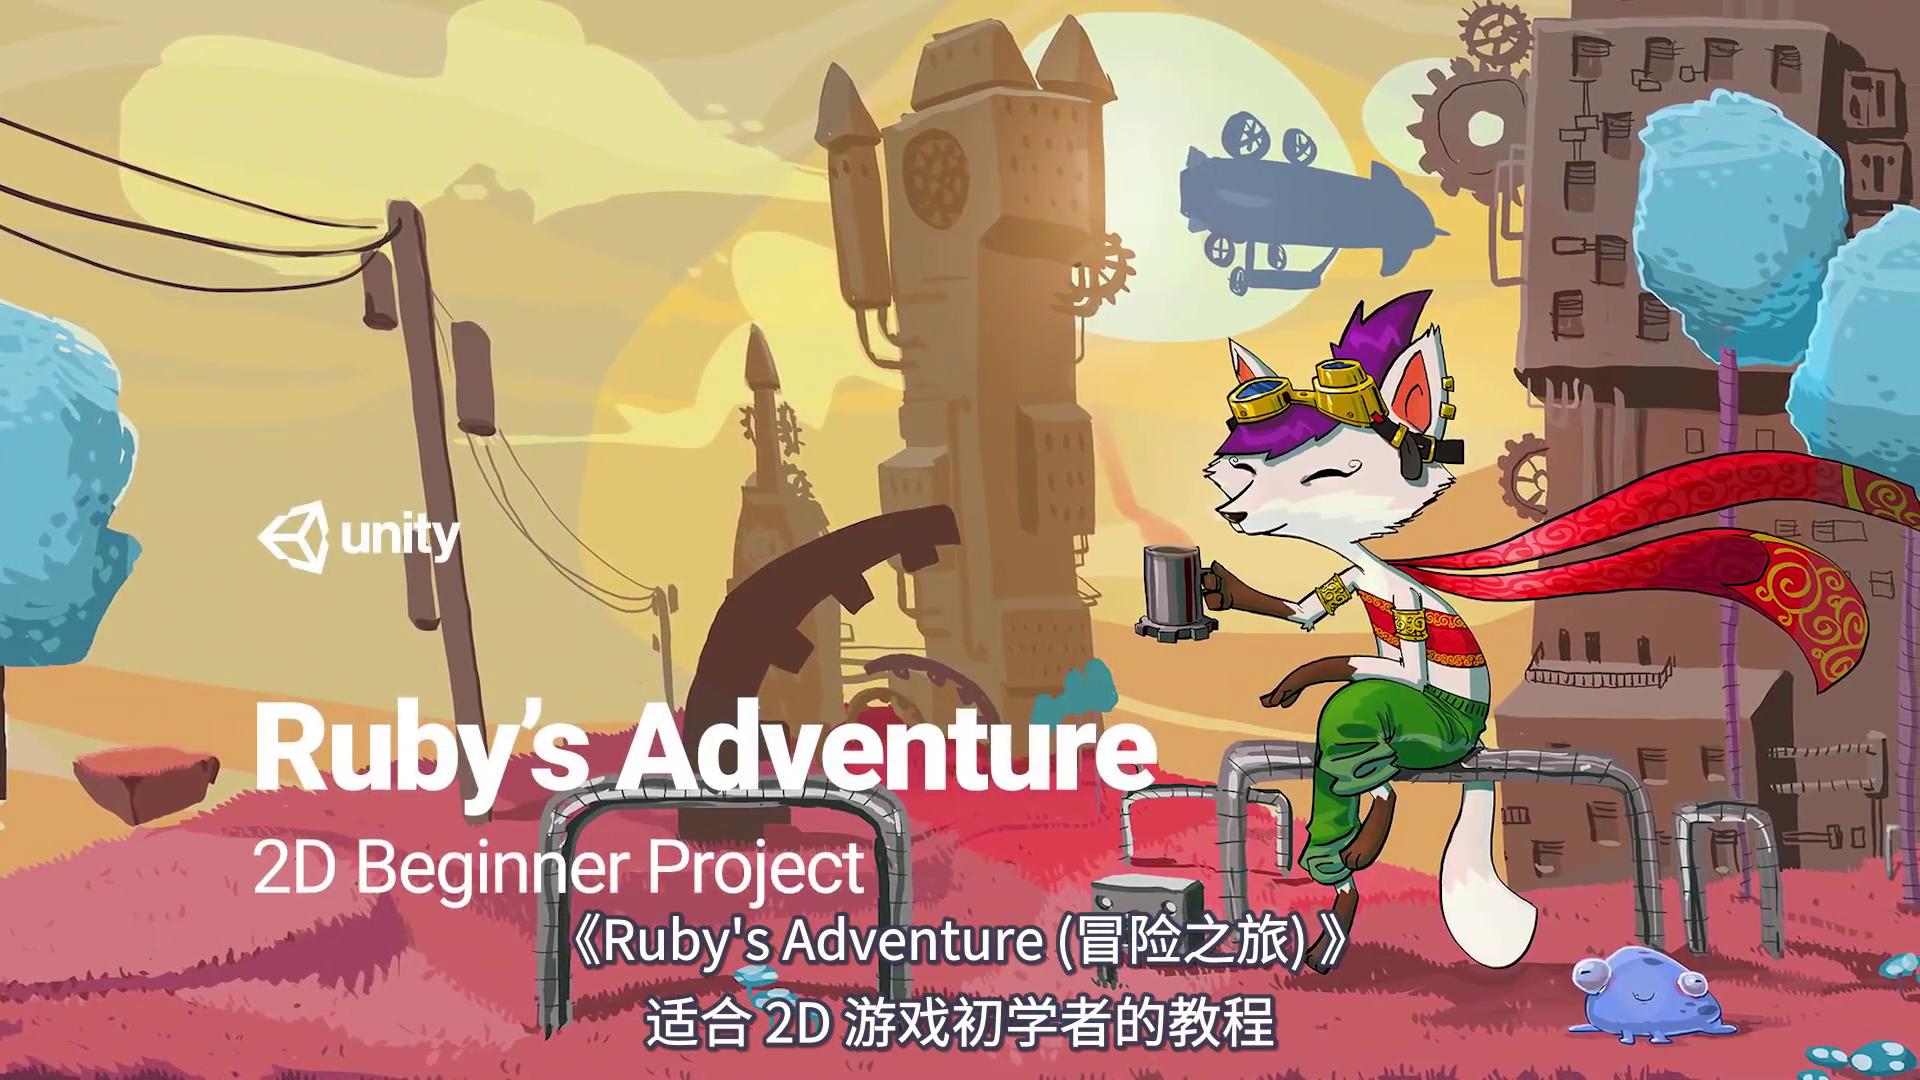 Unity2D游戏初学者教程《Ruby's Adventure》